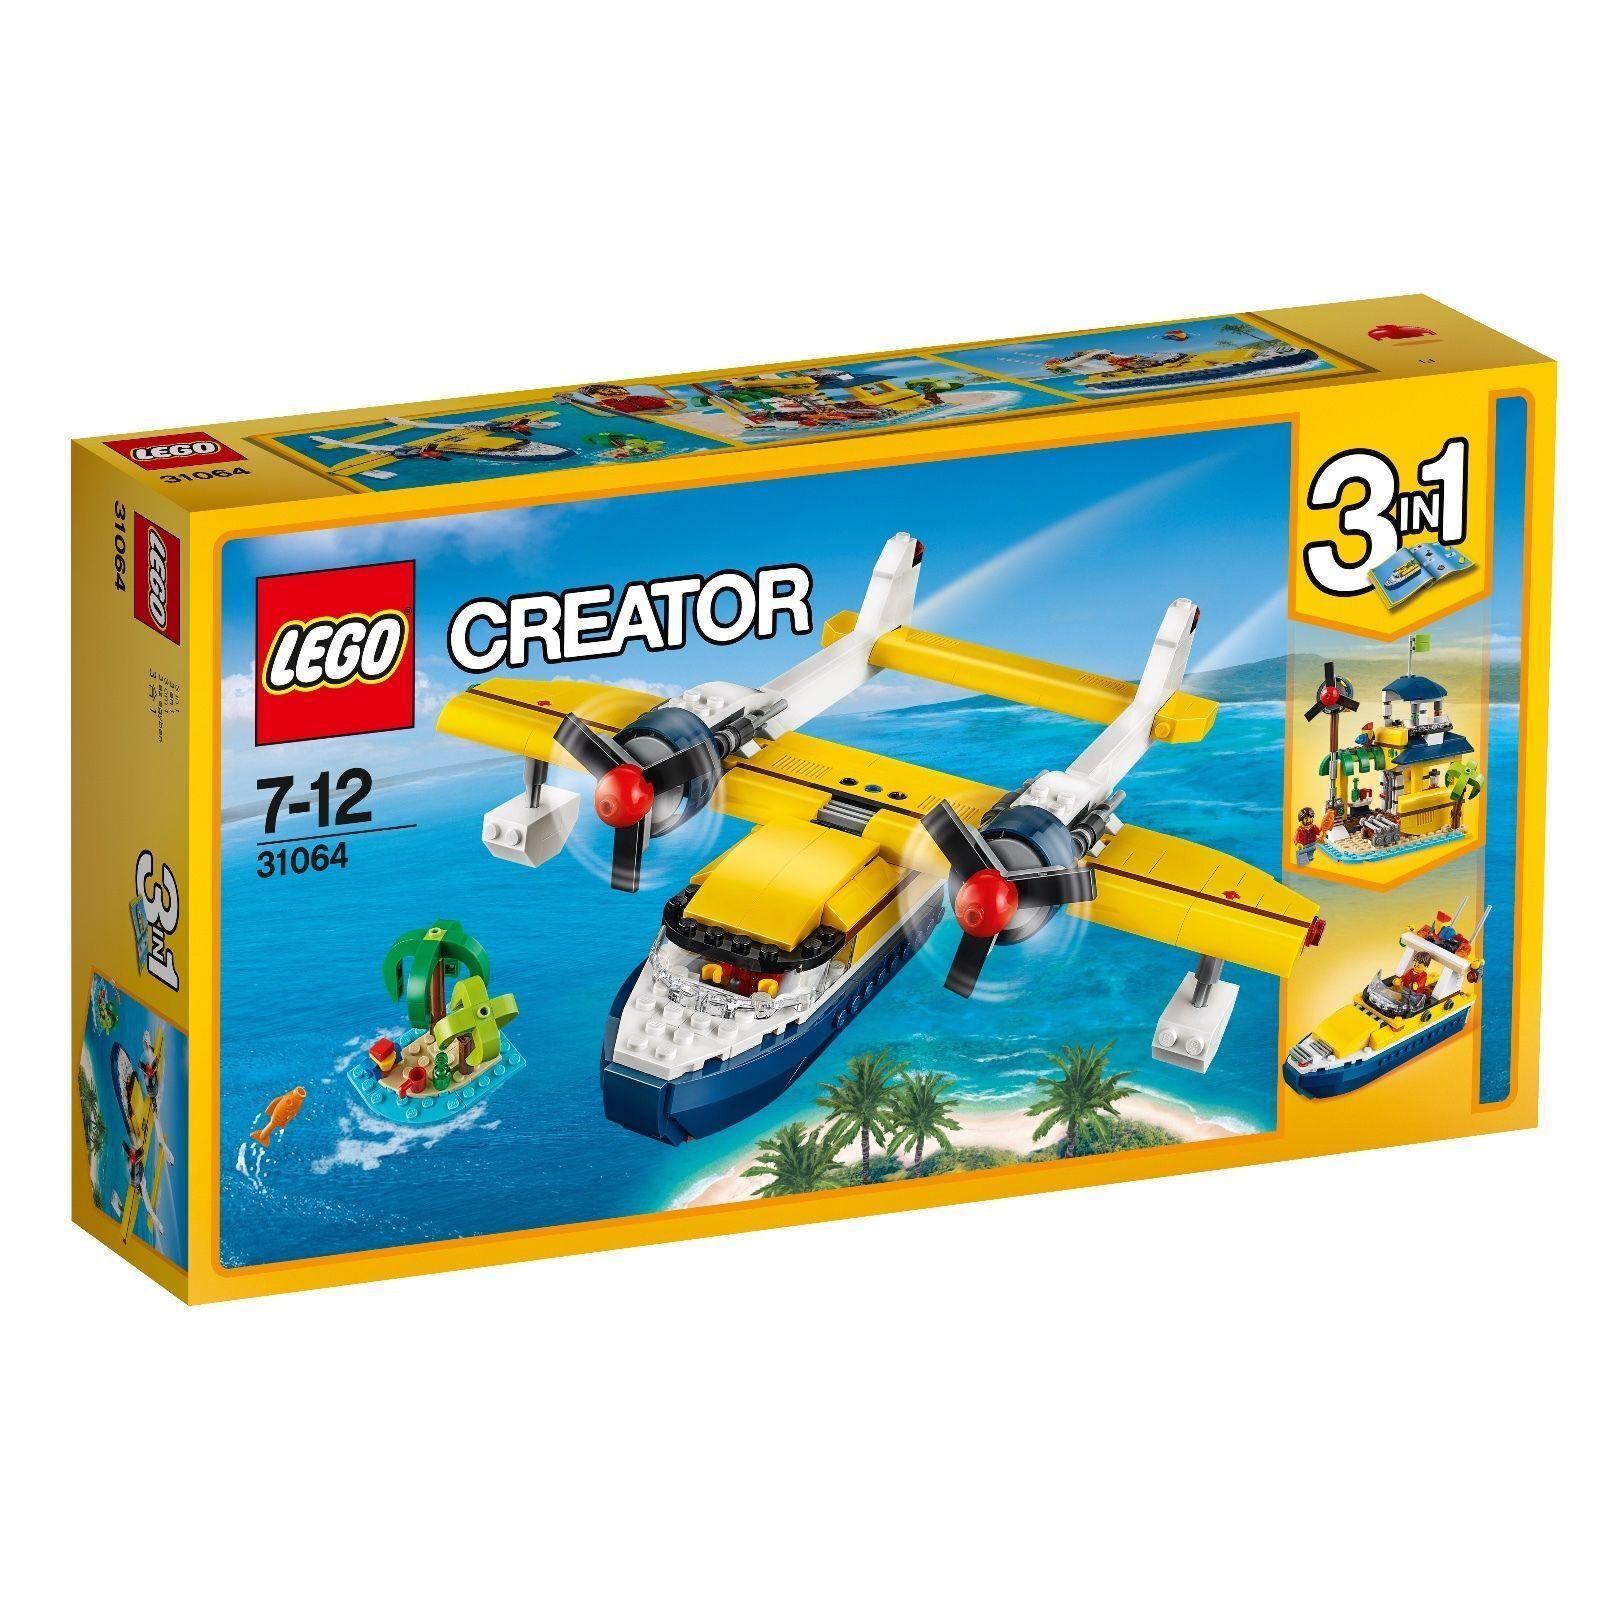 LEGO ® Creator 31064 acqua aereo-AVVENTURA NUOVO OVP _ Island Adventures NEW MISB